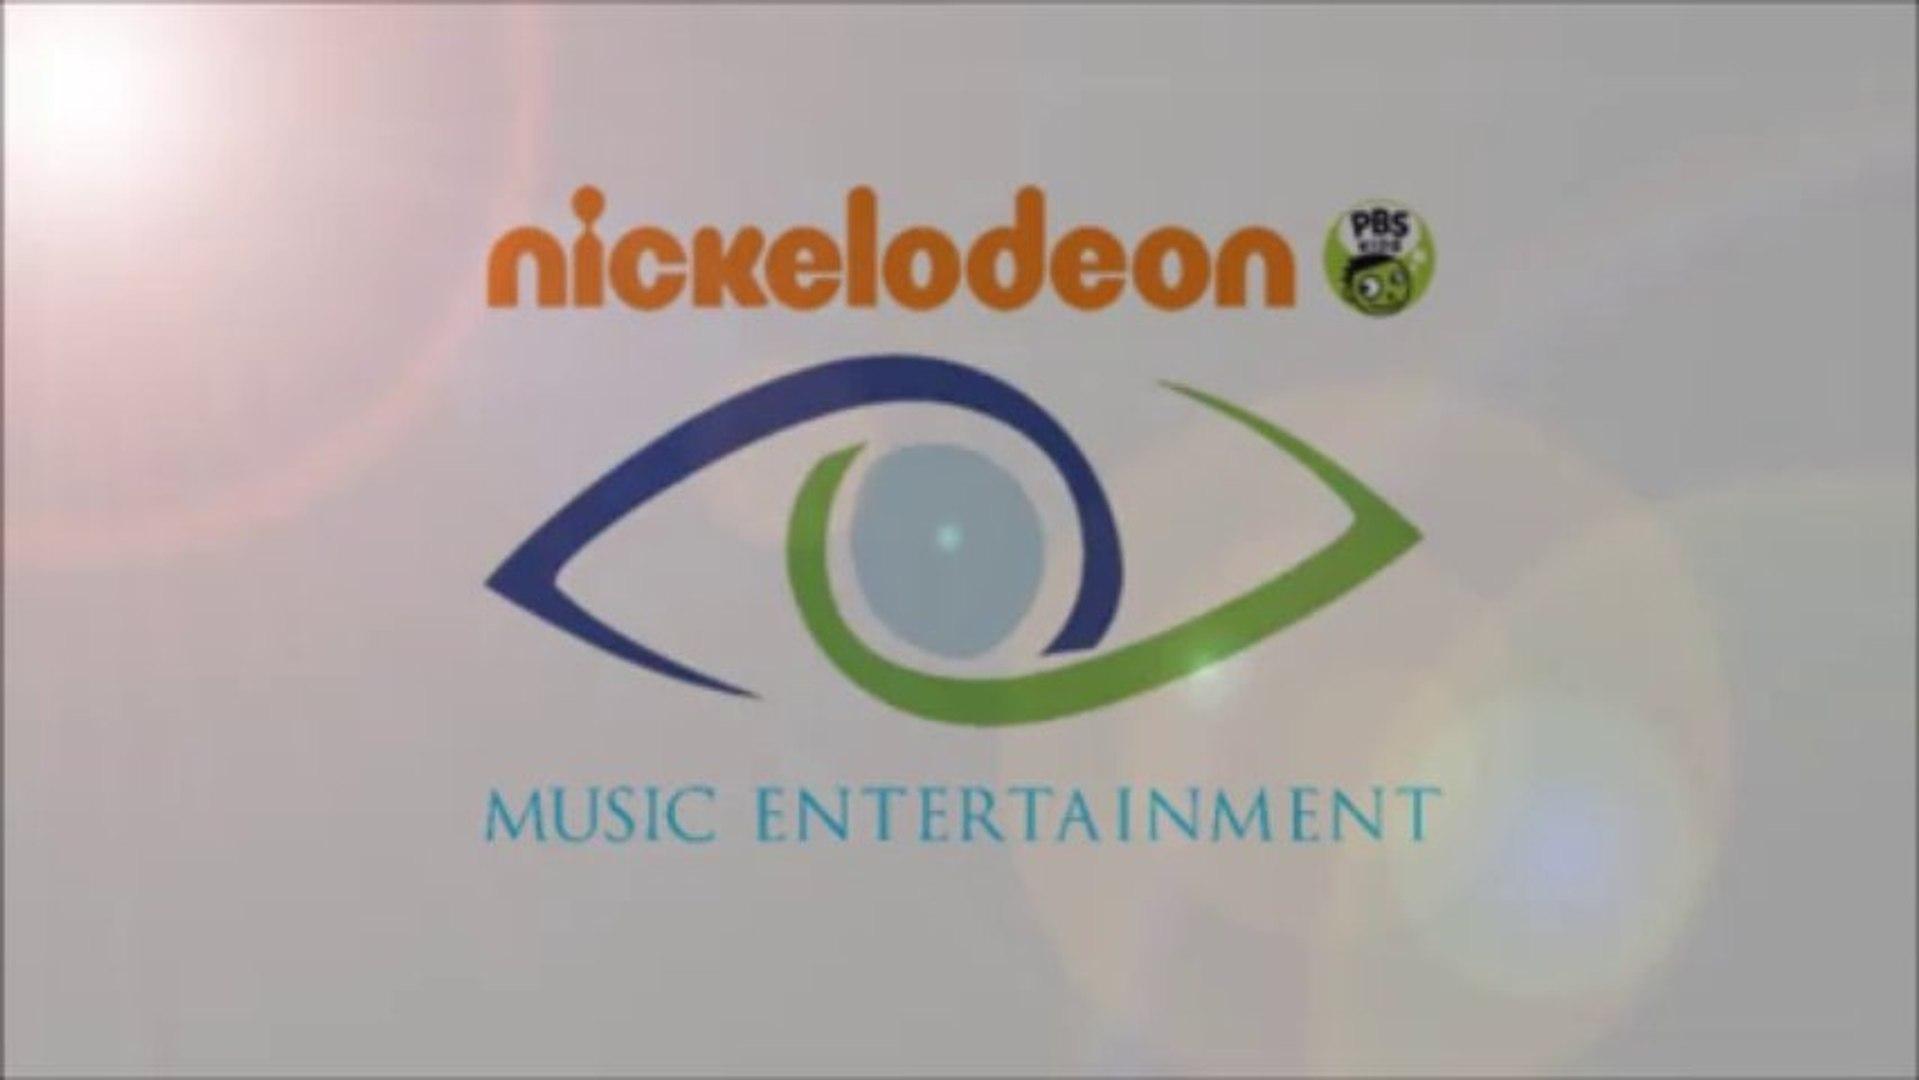 Nickelodeon/PBS Kids Music Entertainment logo (2013) (1st logo)